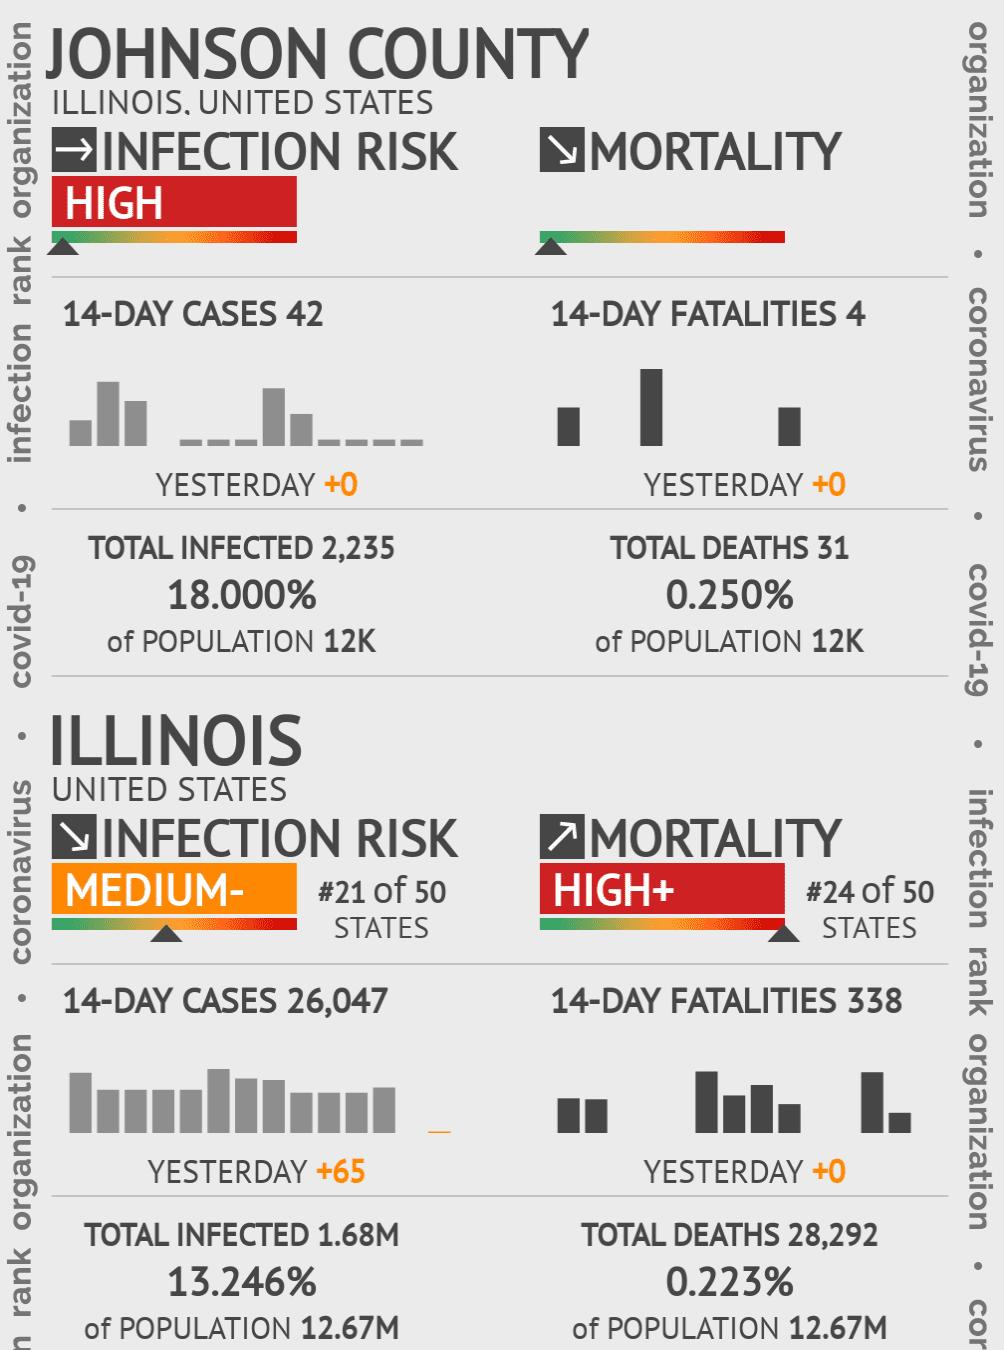 Johnson County Coronavirus Covid-19 Risk of Infection on July 24, 2021